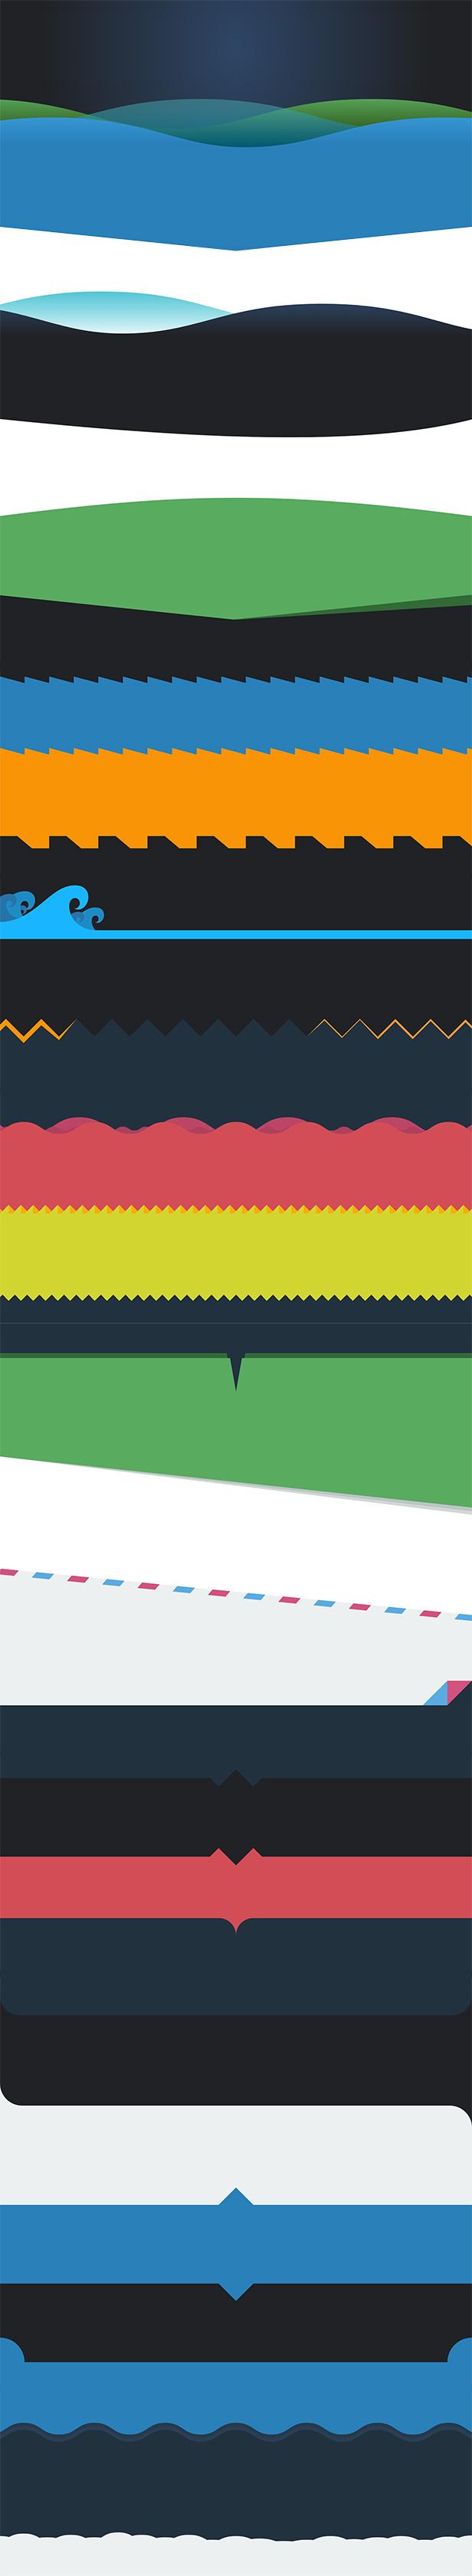 25 Row Separators SVG & CSS3